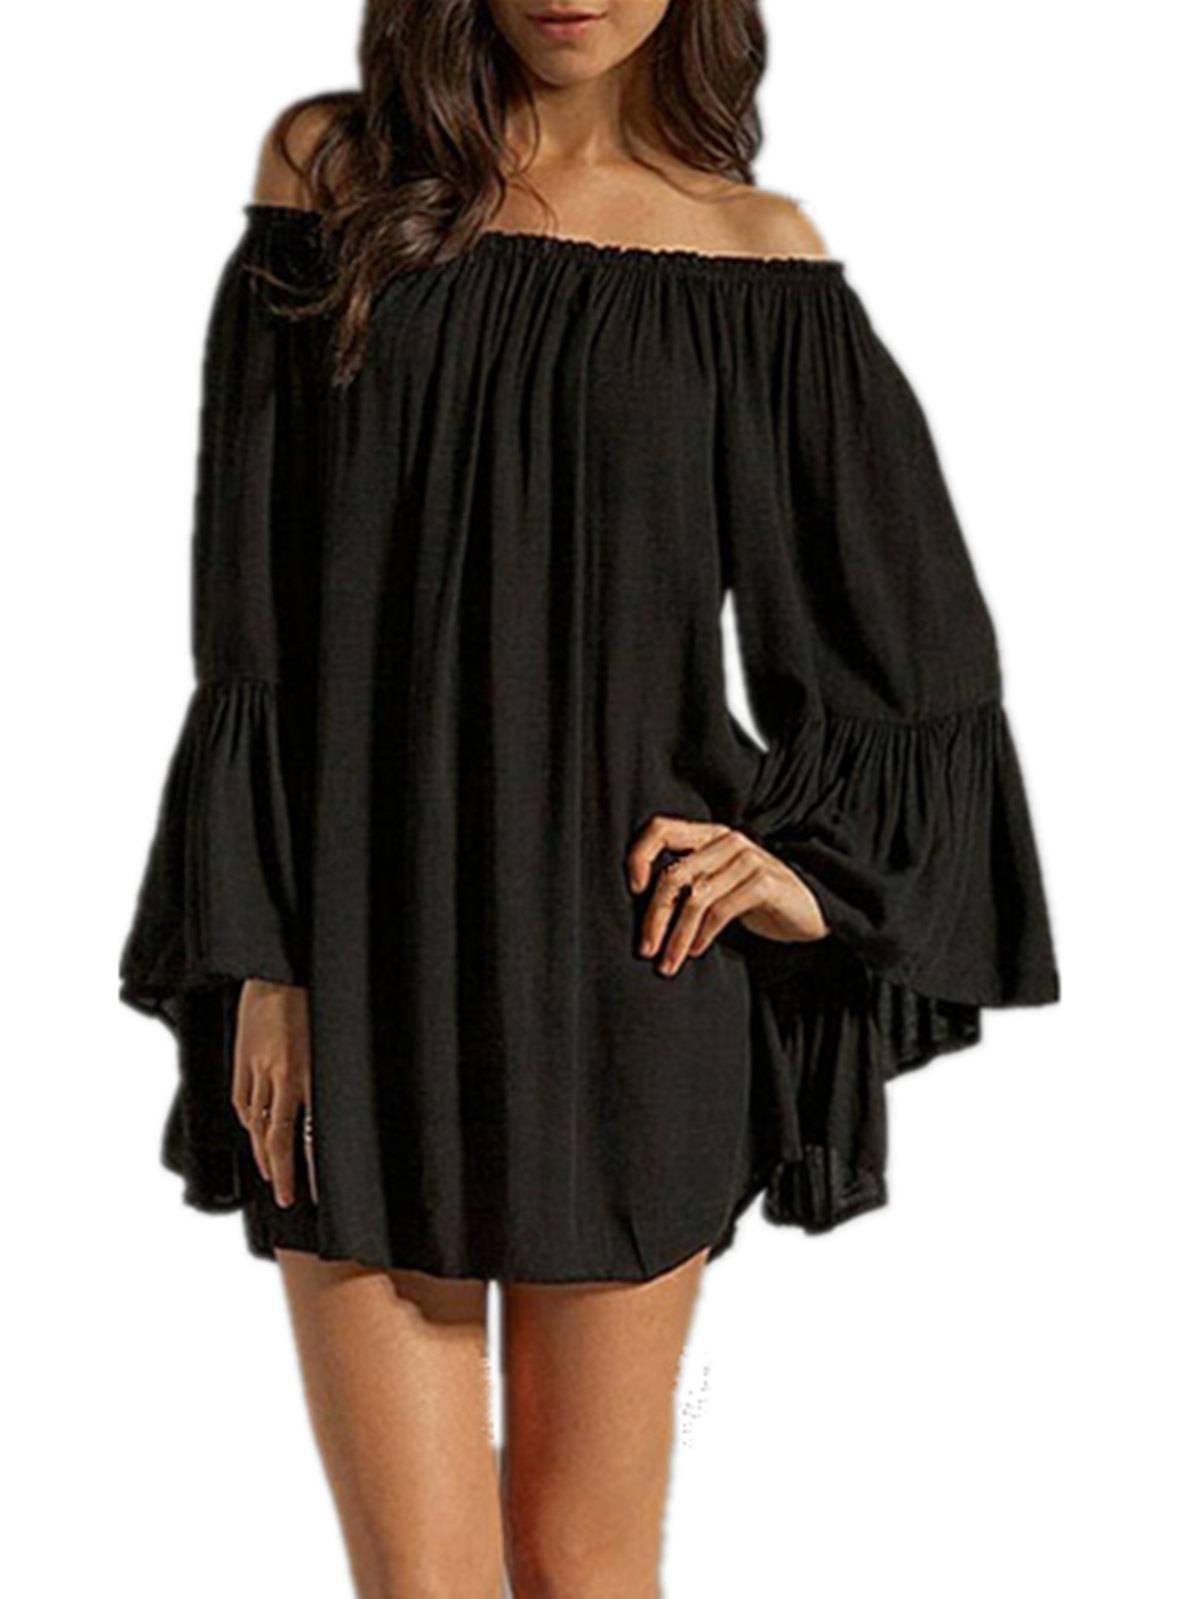 ZANZEA Women's Sexy Off Shoulder Chiffon Boho Ruffle Sleeve Blouse Mini Dress Black XL